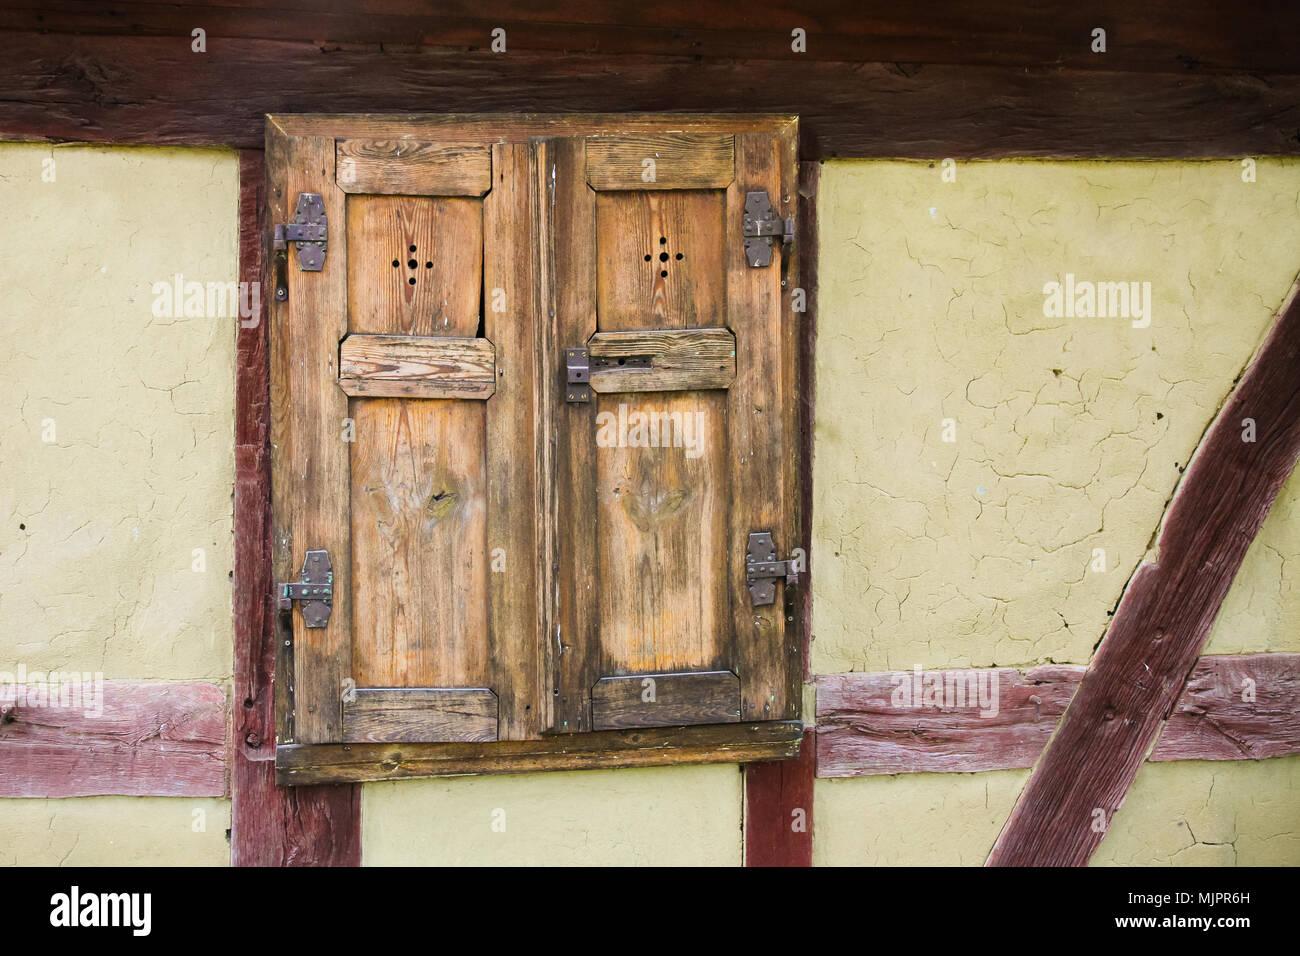 For Load Bearing Stockfotos & For Load Bearing Bilder - Seite 3 - Alamy